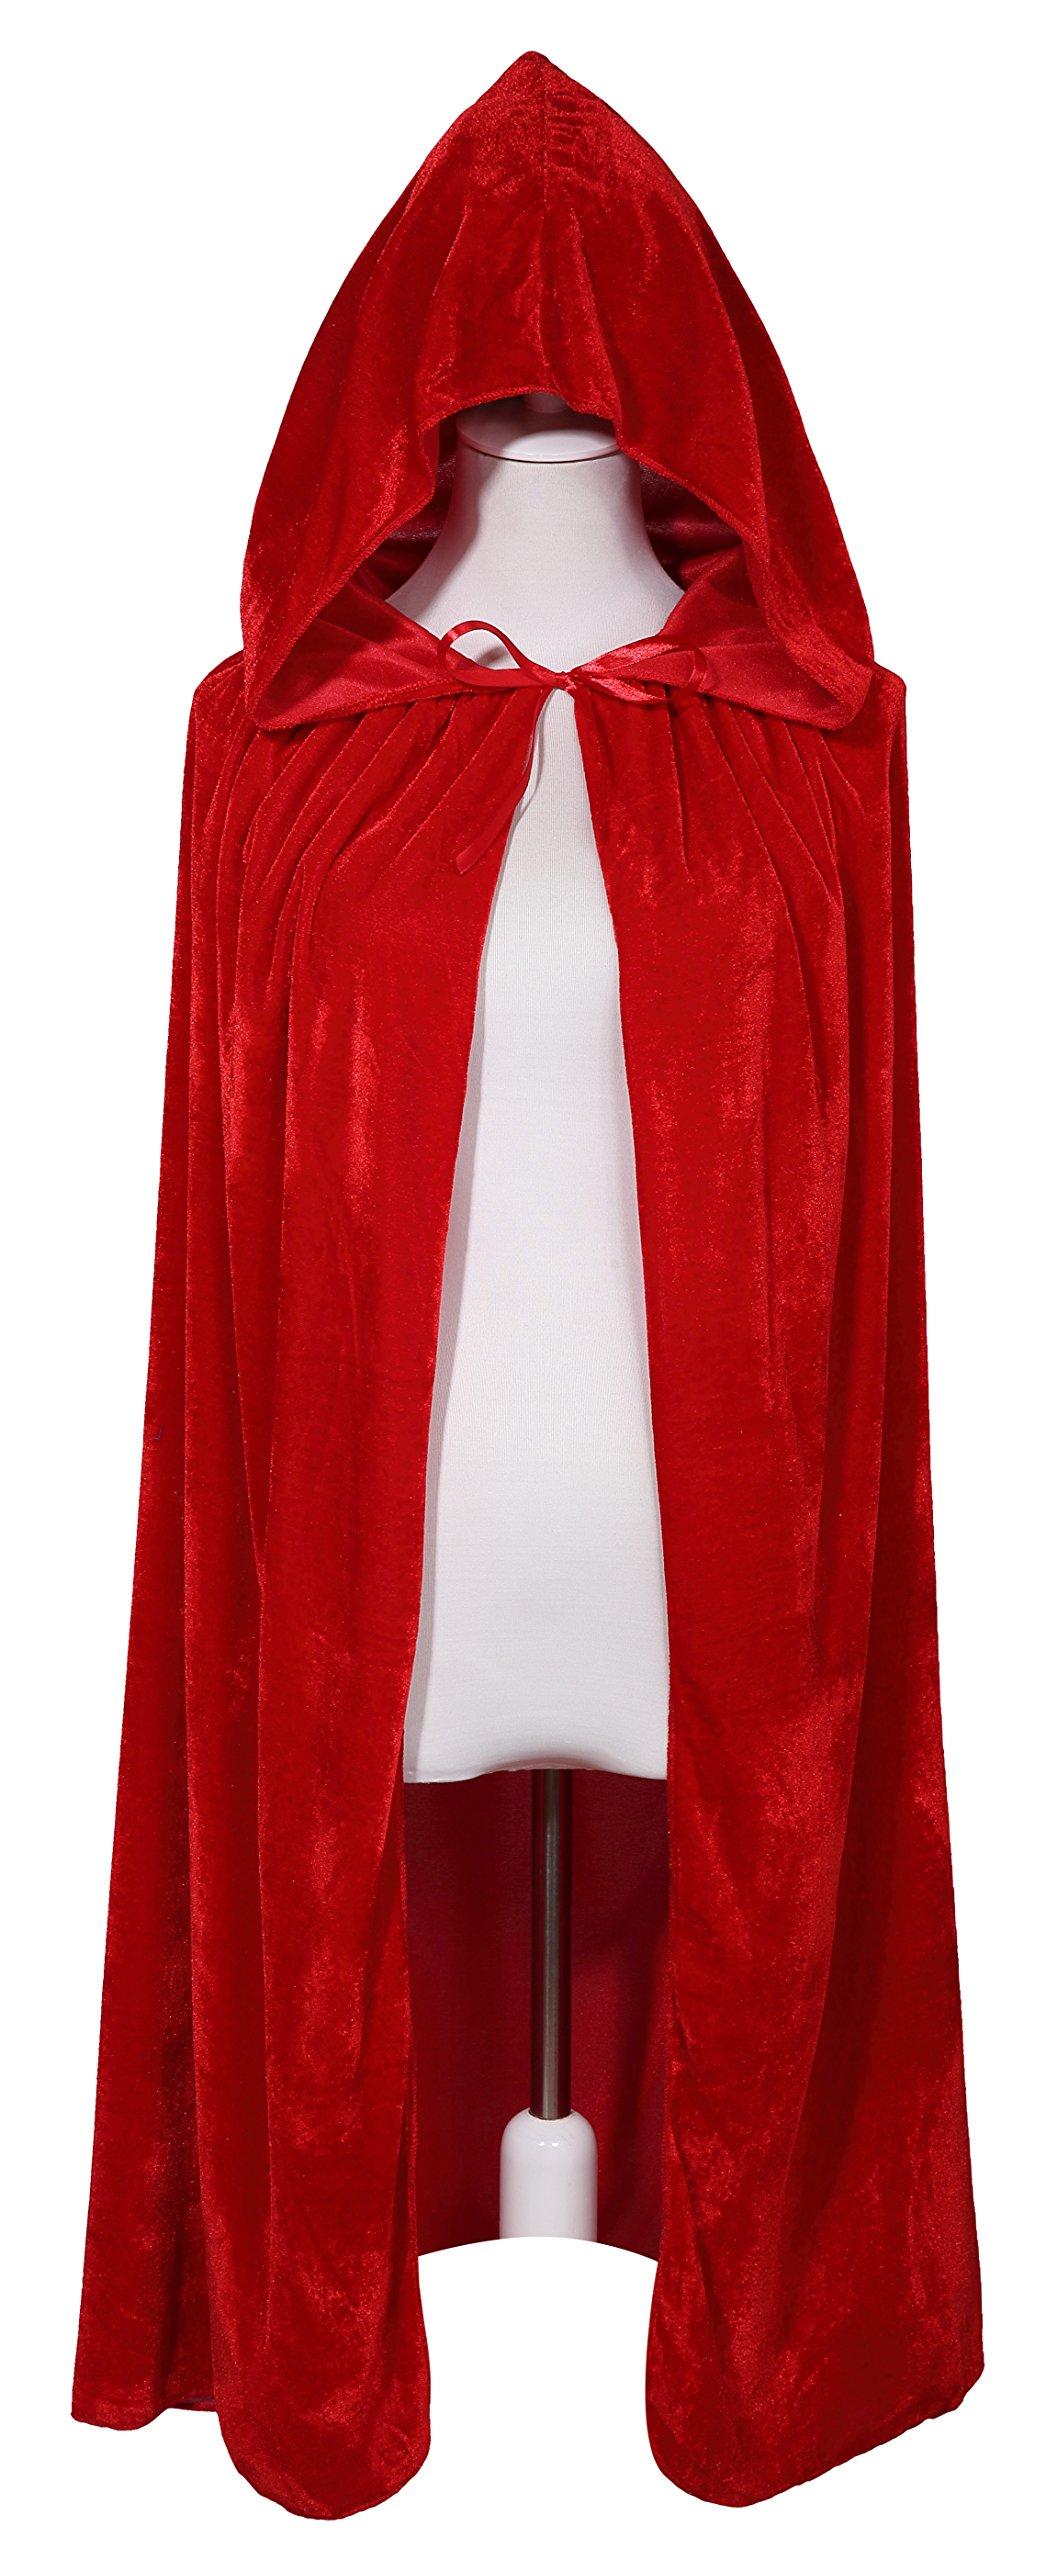 BIGXIAN Kids Hooded Velvet Cloak Halloween Christmas Fancy Cape for Kids (Red)